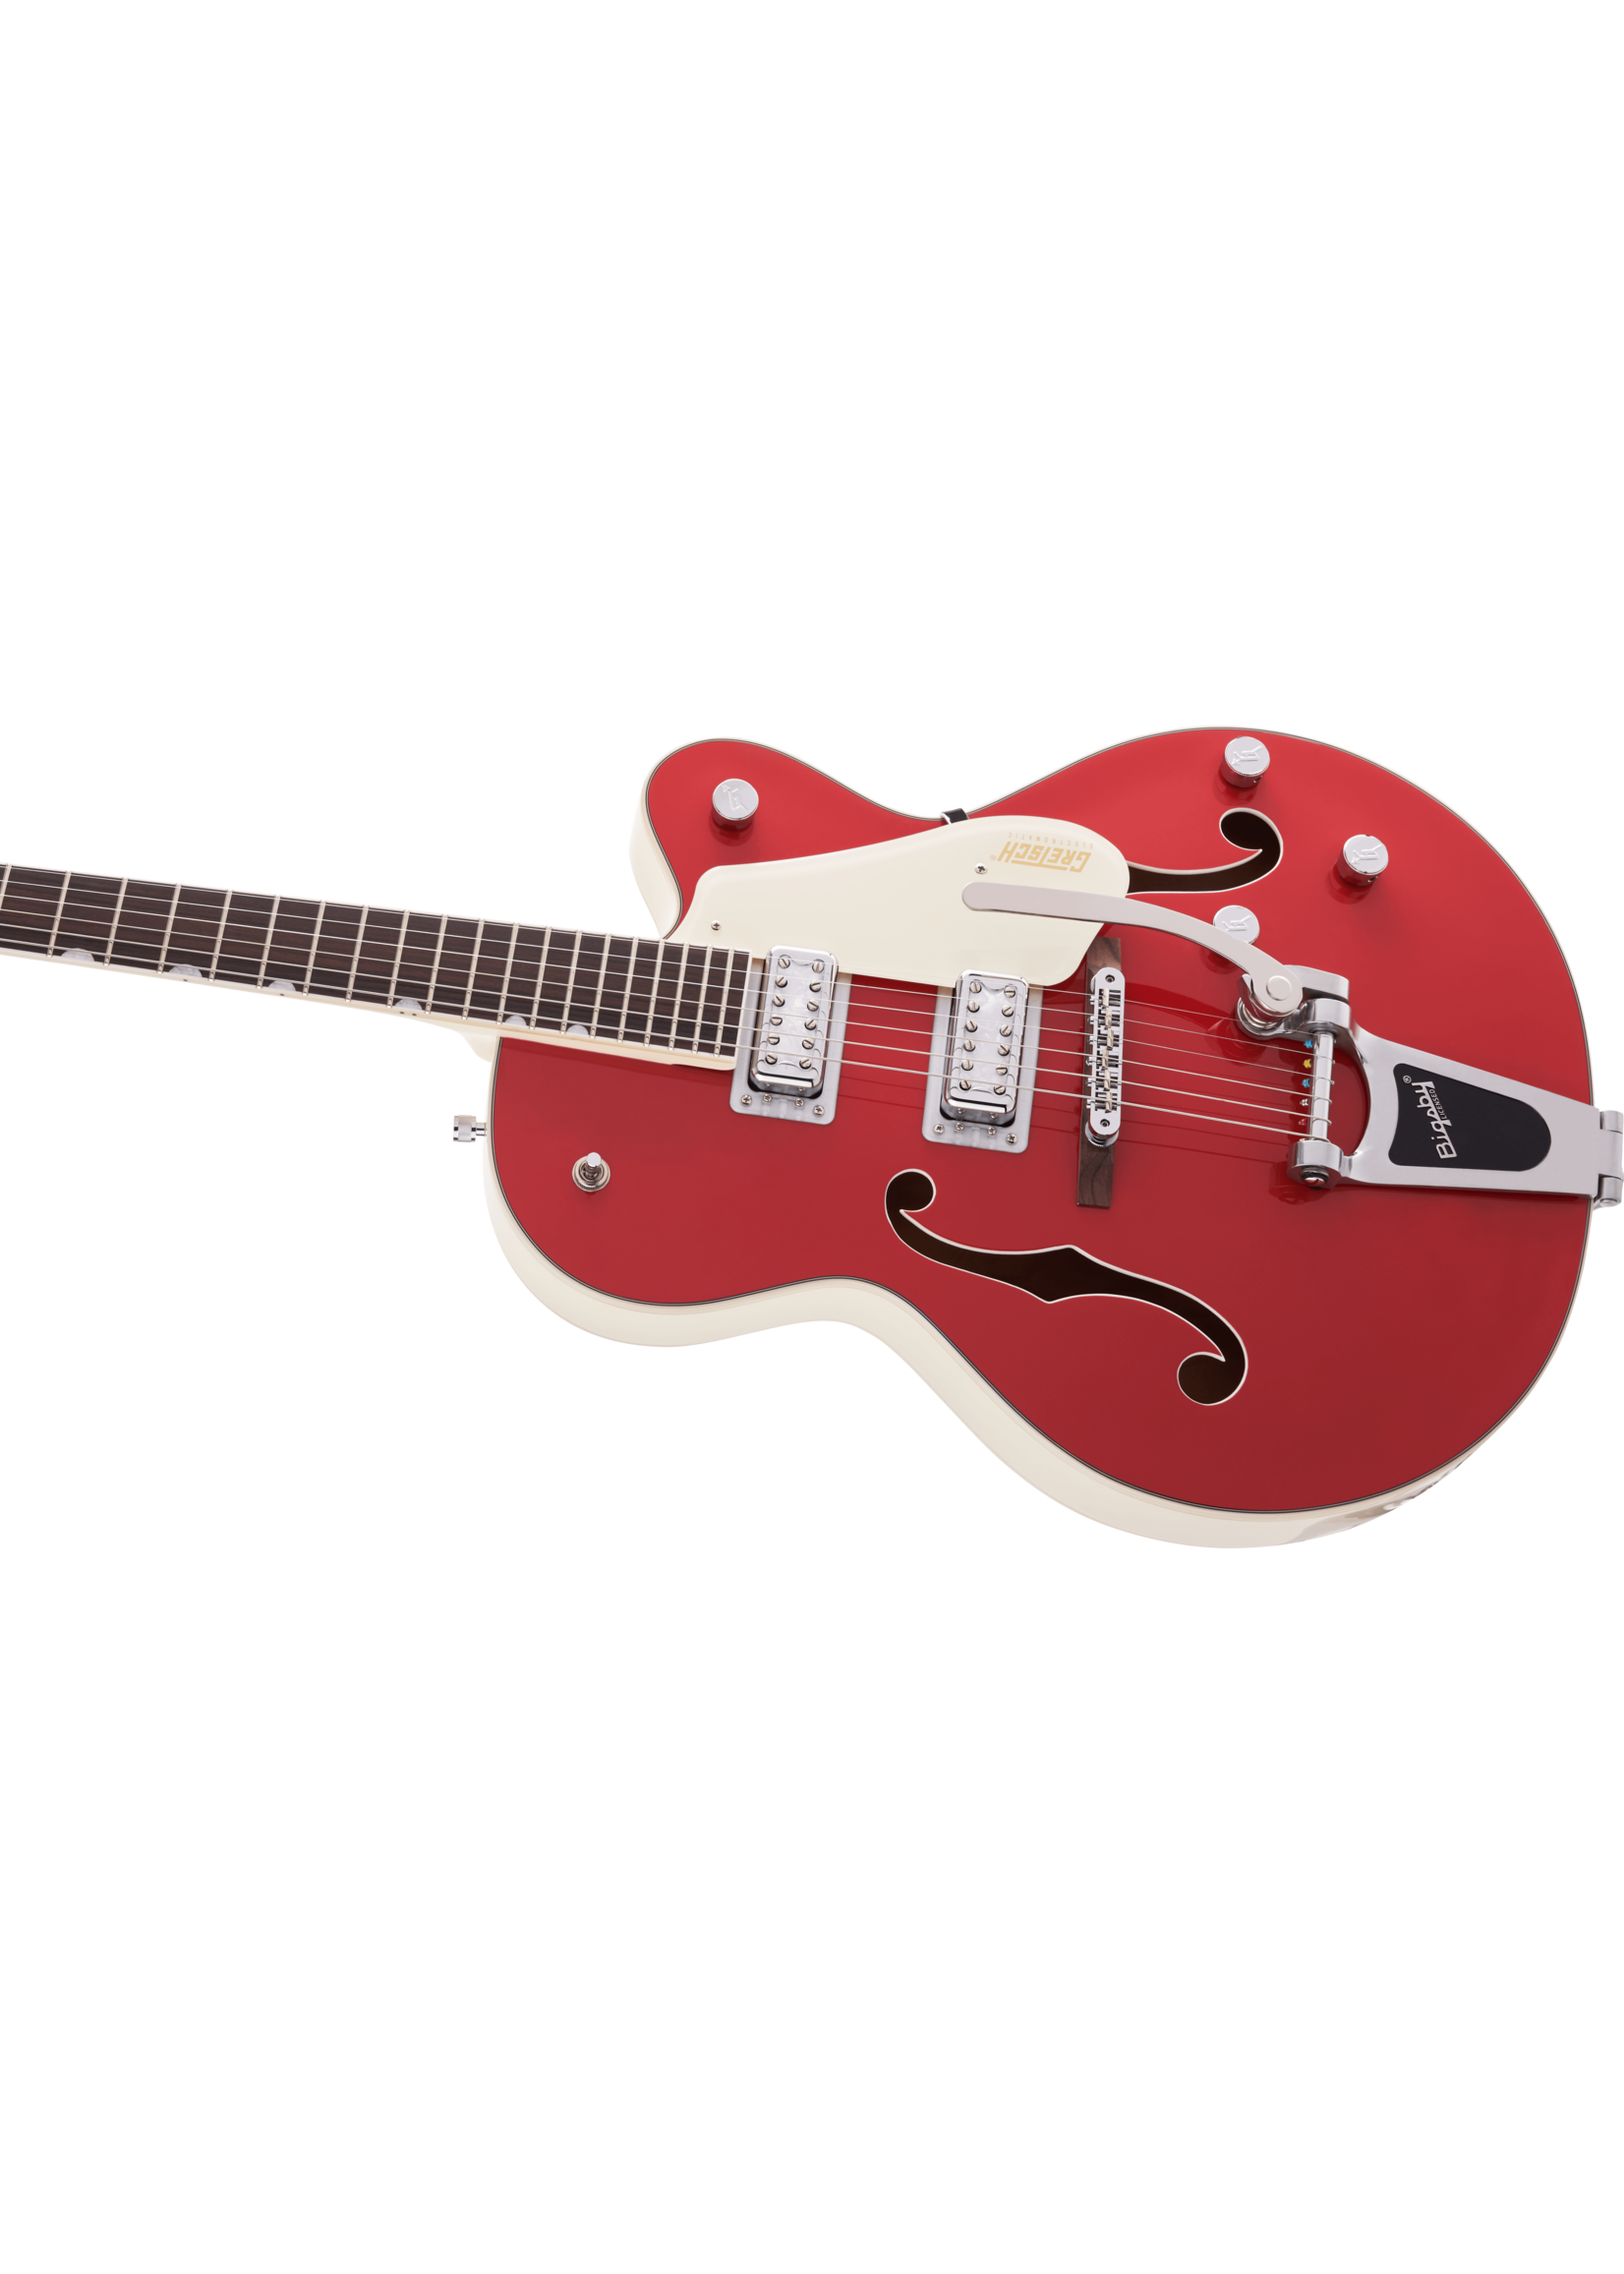 Gretsch Gretsch G5410T Electromatic Tri-Five Two Tone Fiesta Red/Vintage White